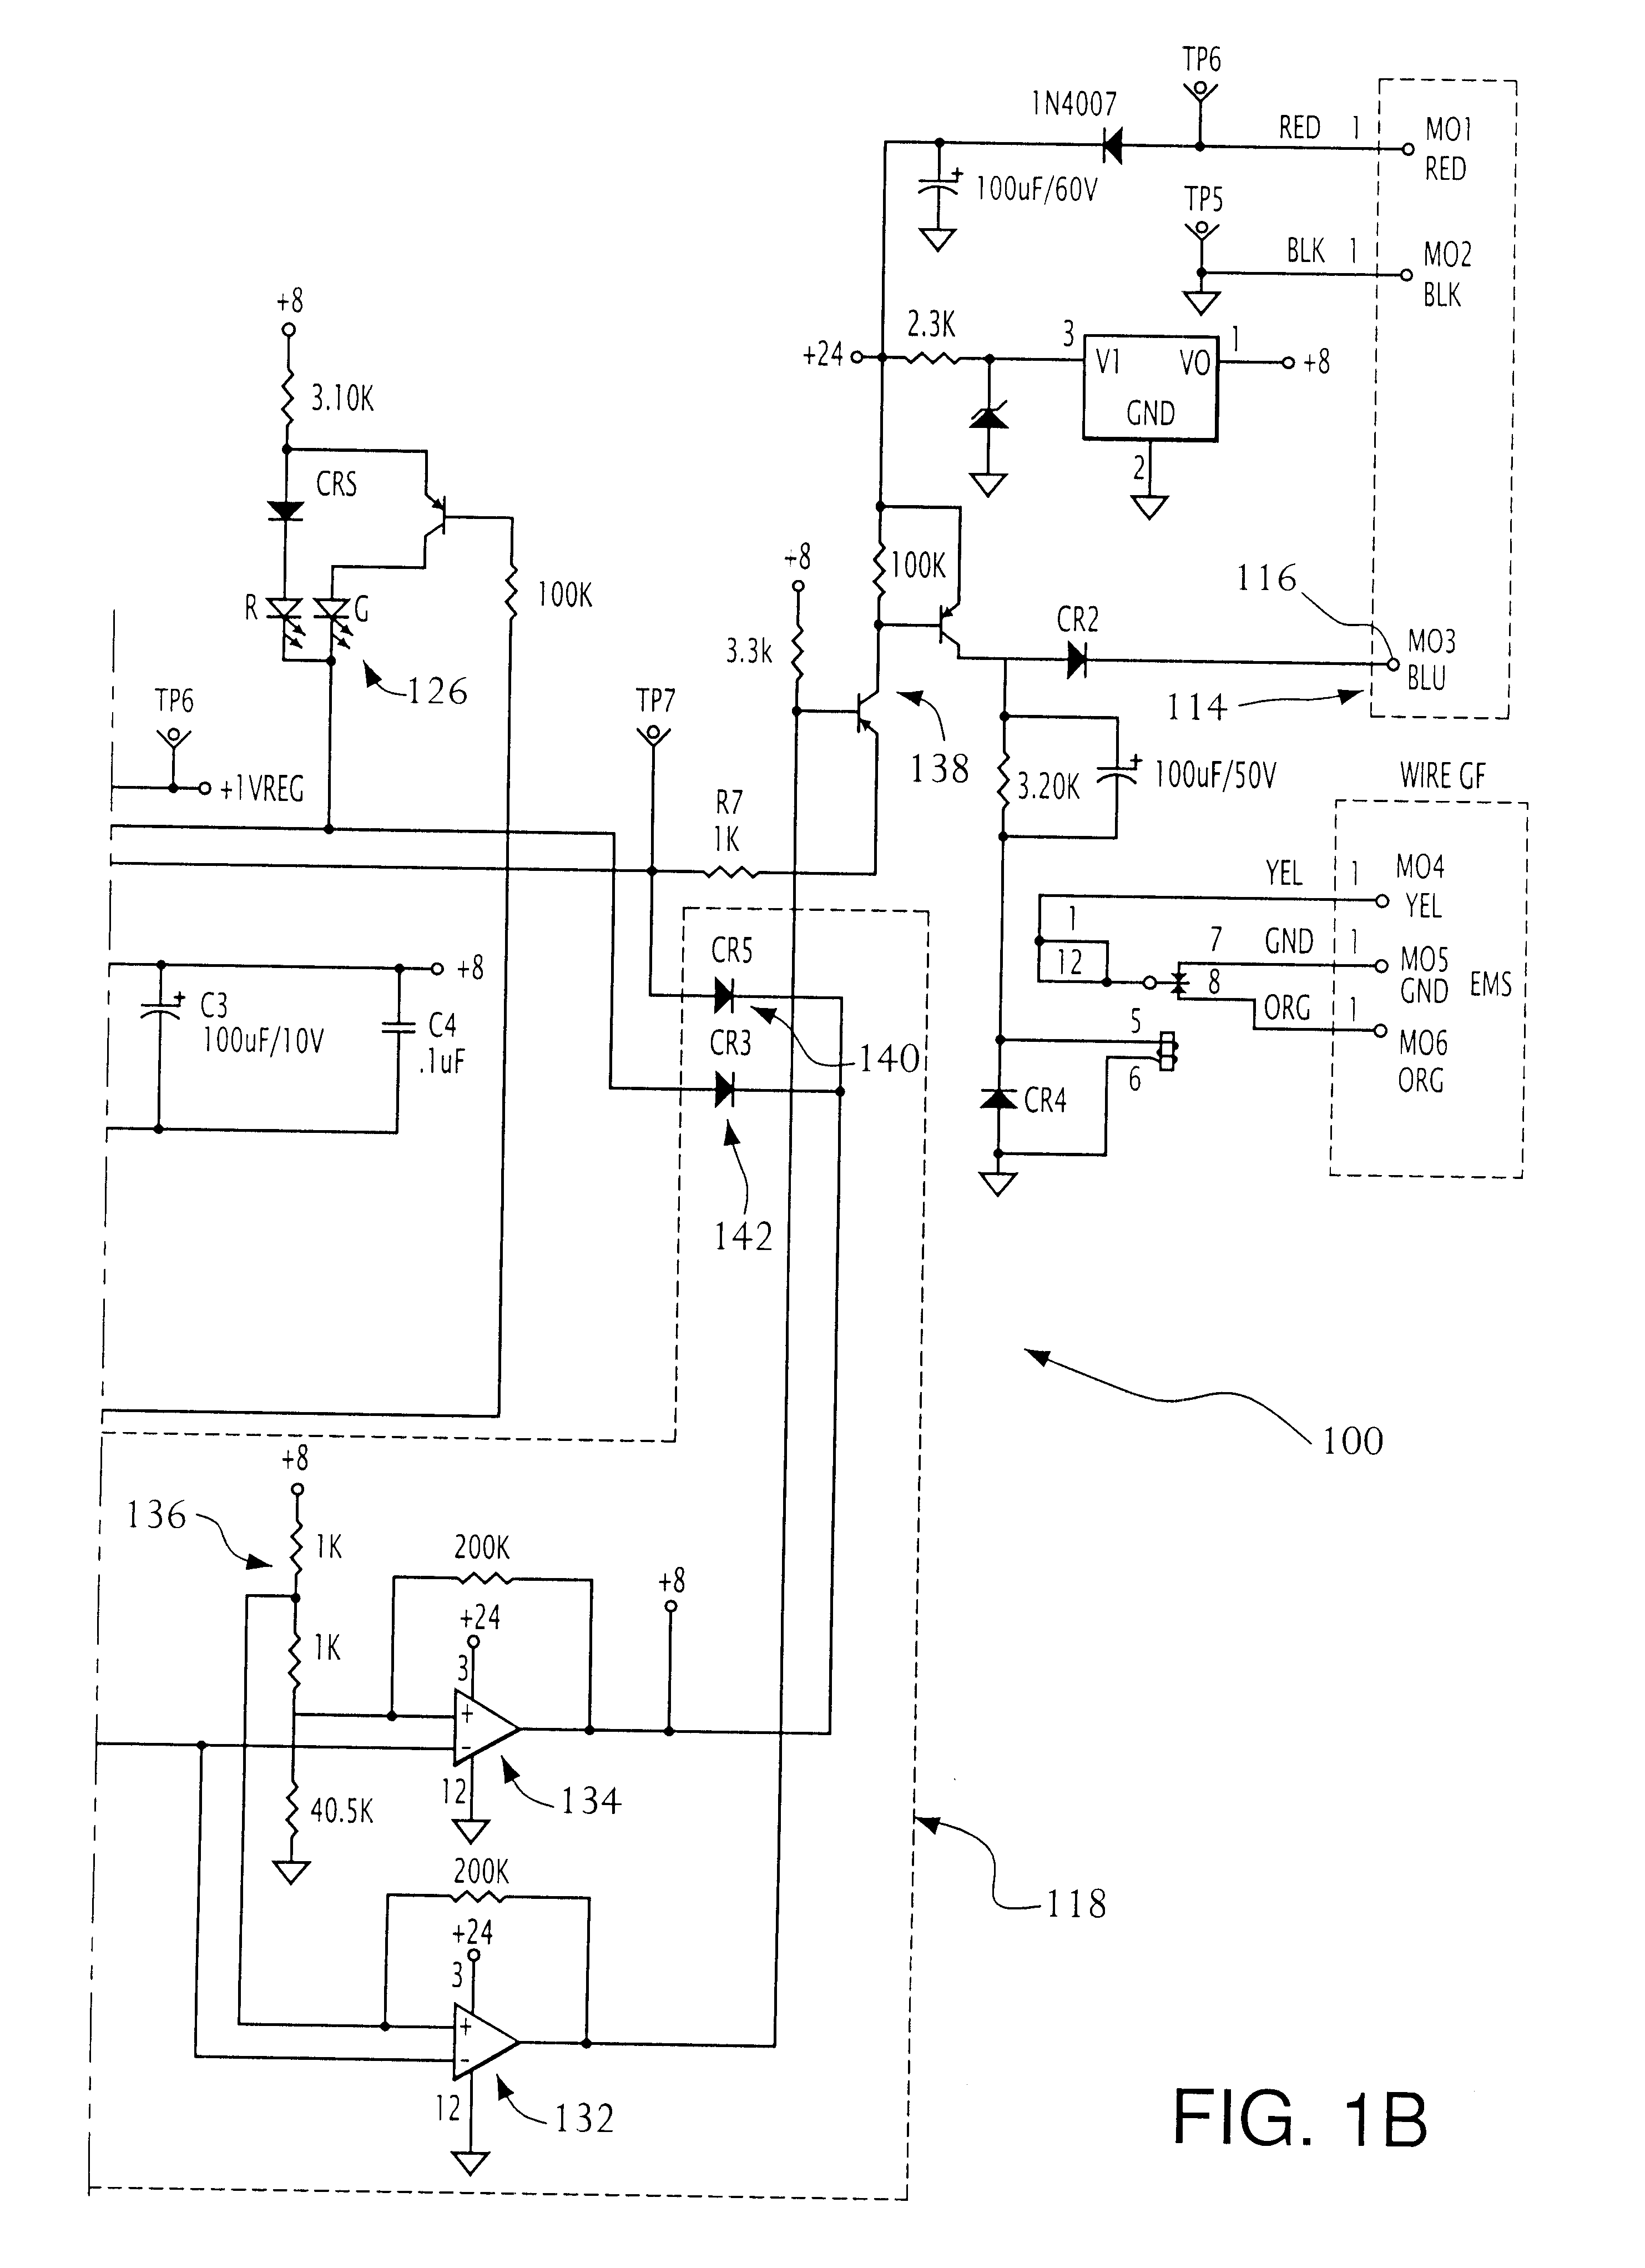 timer switch circuit diagram the wiring diagram timer switch circuit diagram vidim wiring diagram circuit diagram